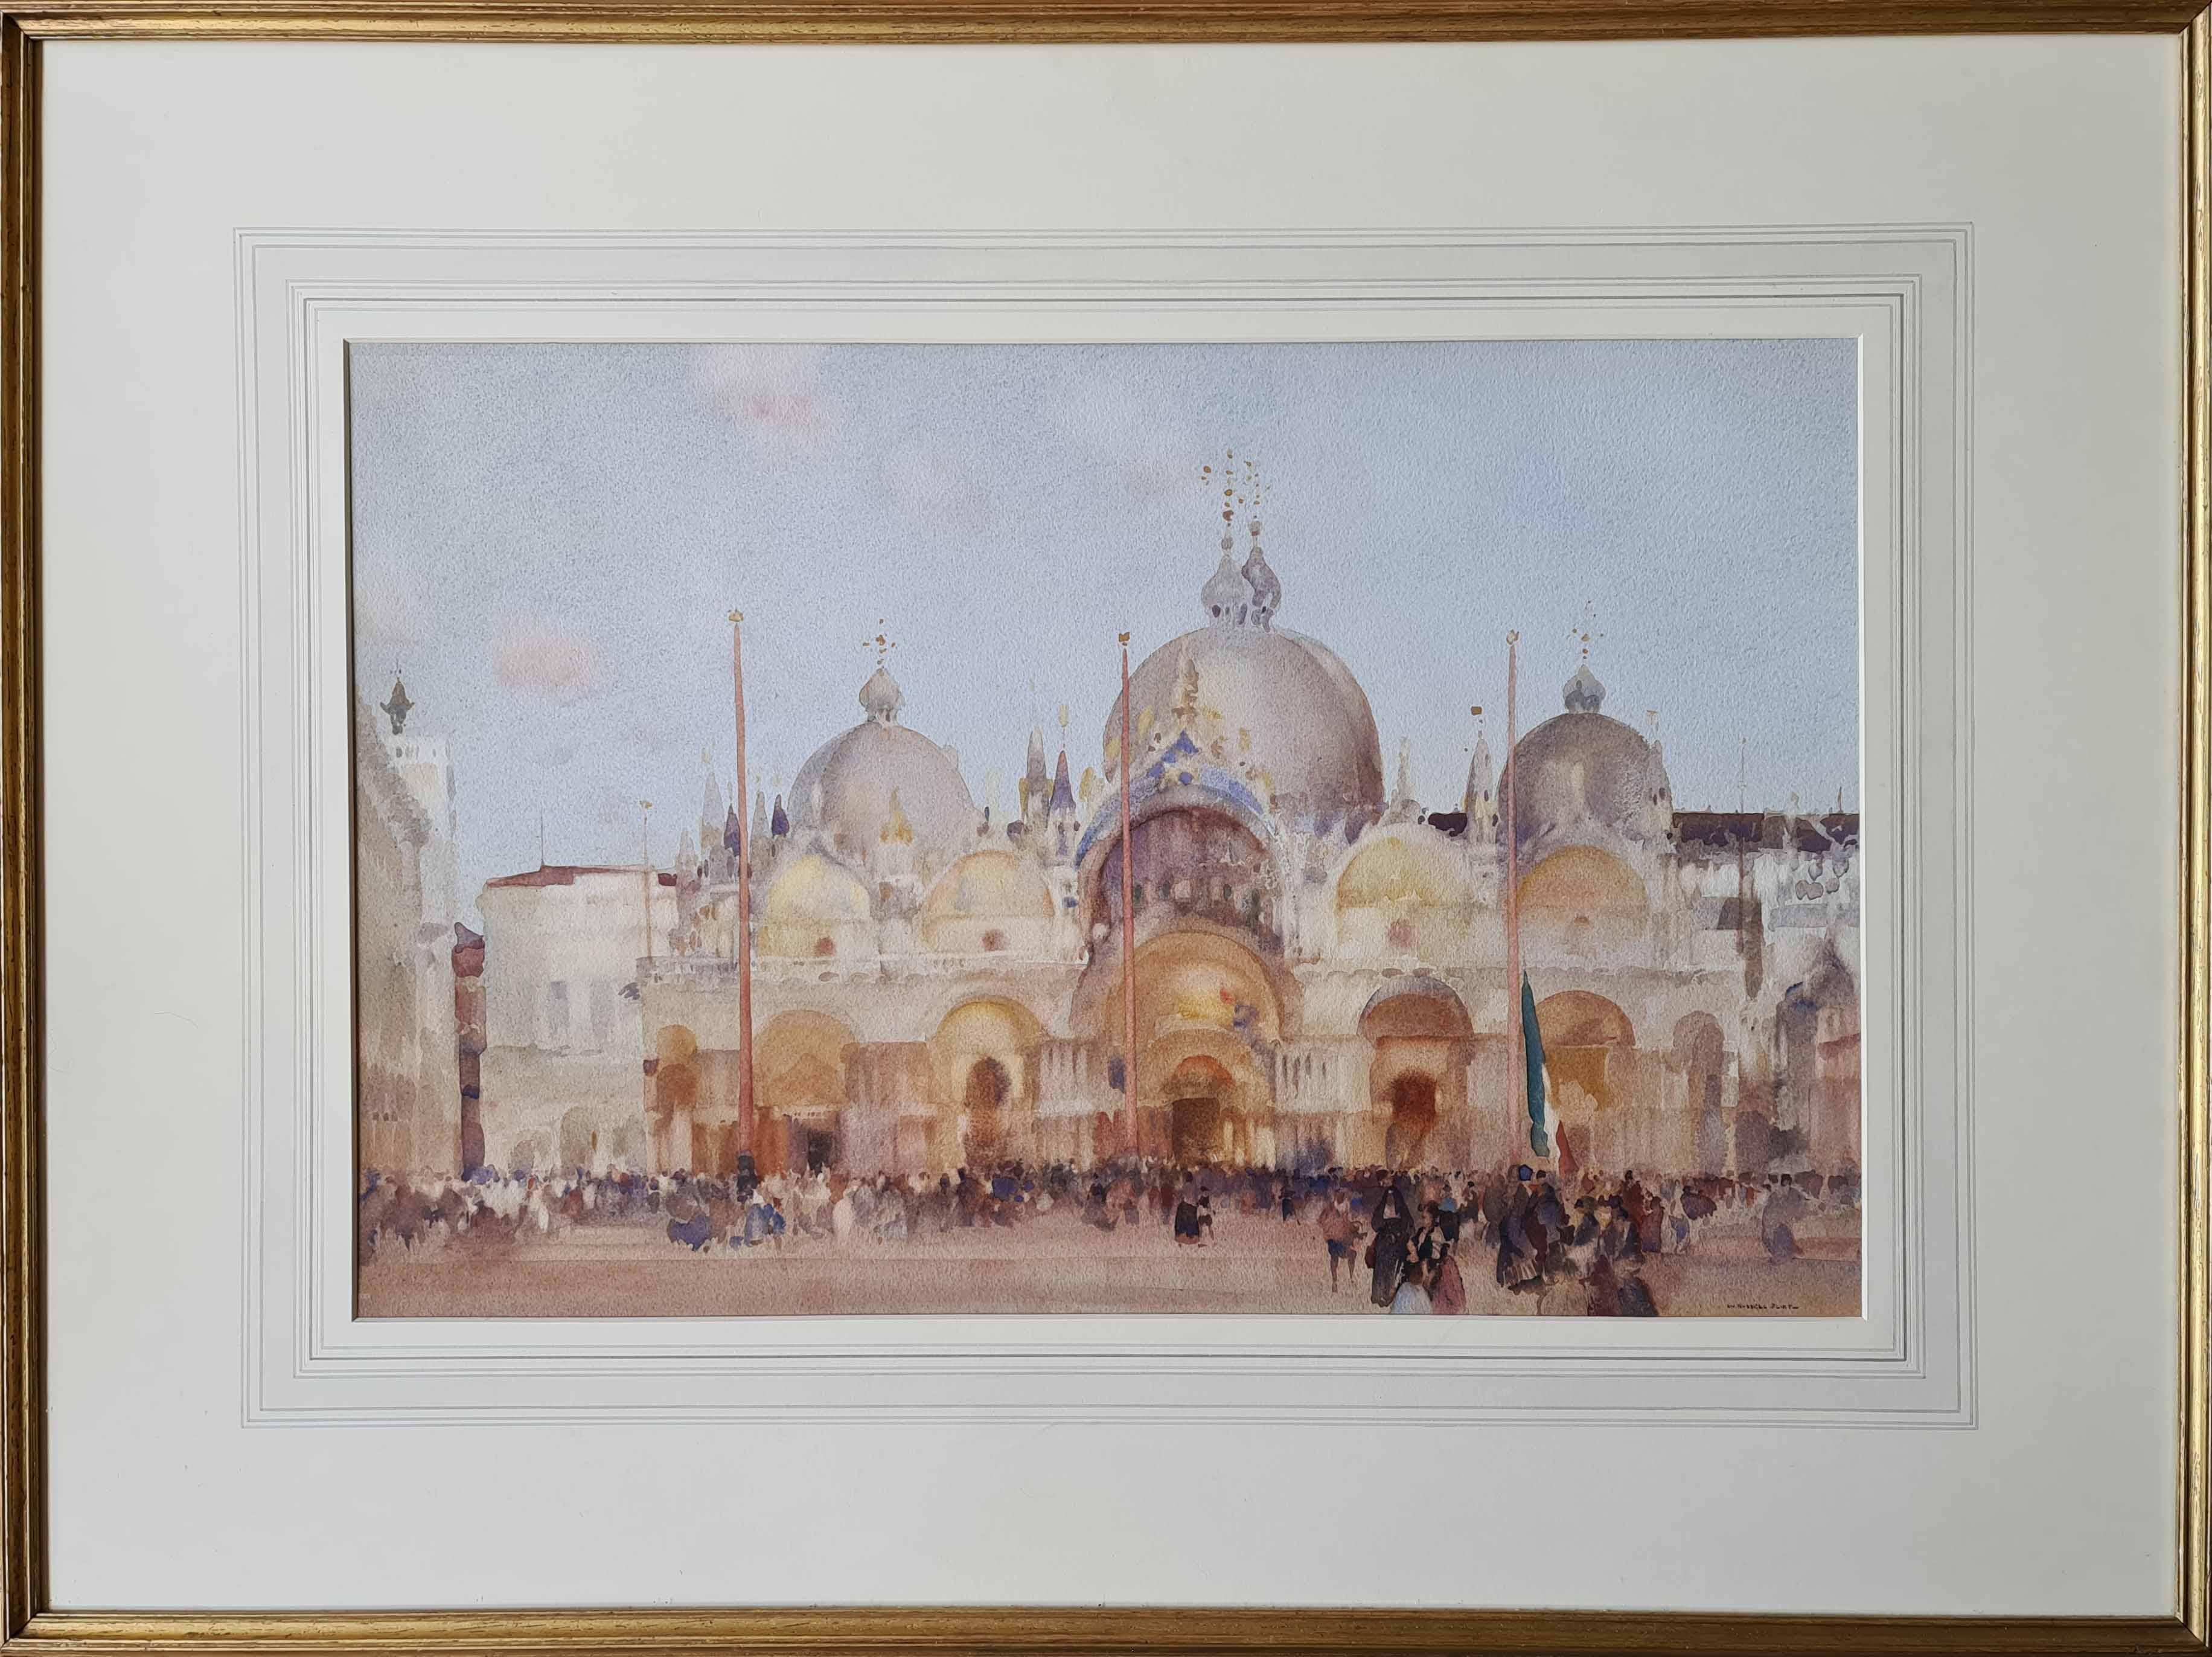 russell flint, original painting, Piazza San Marco, Venice